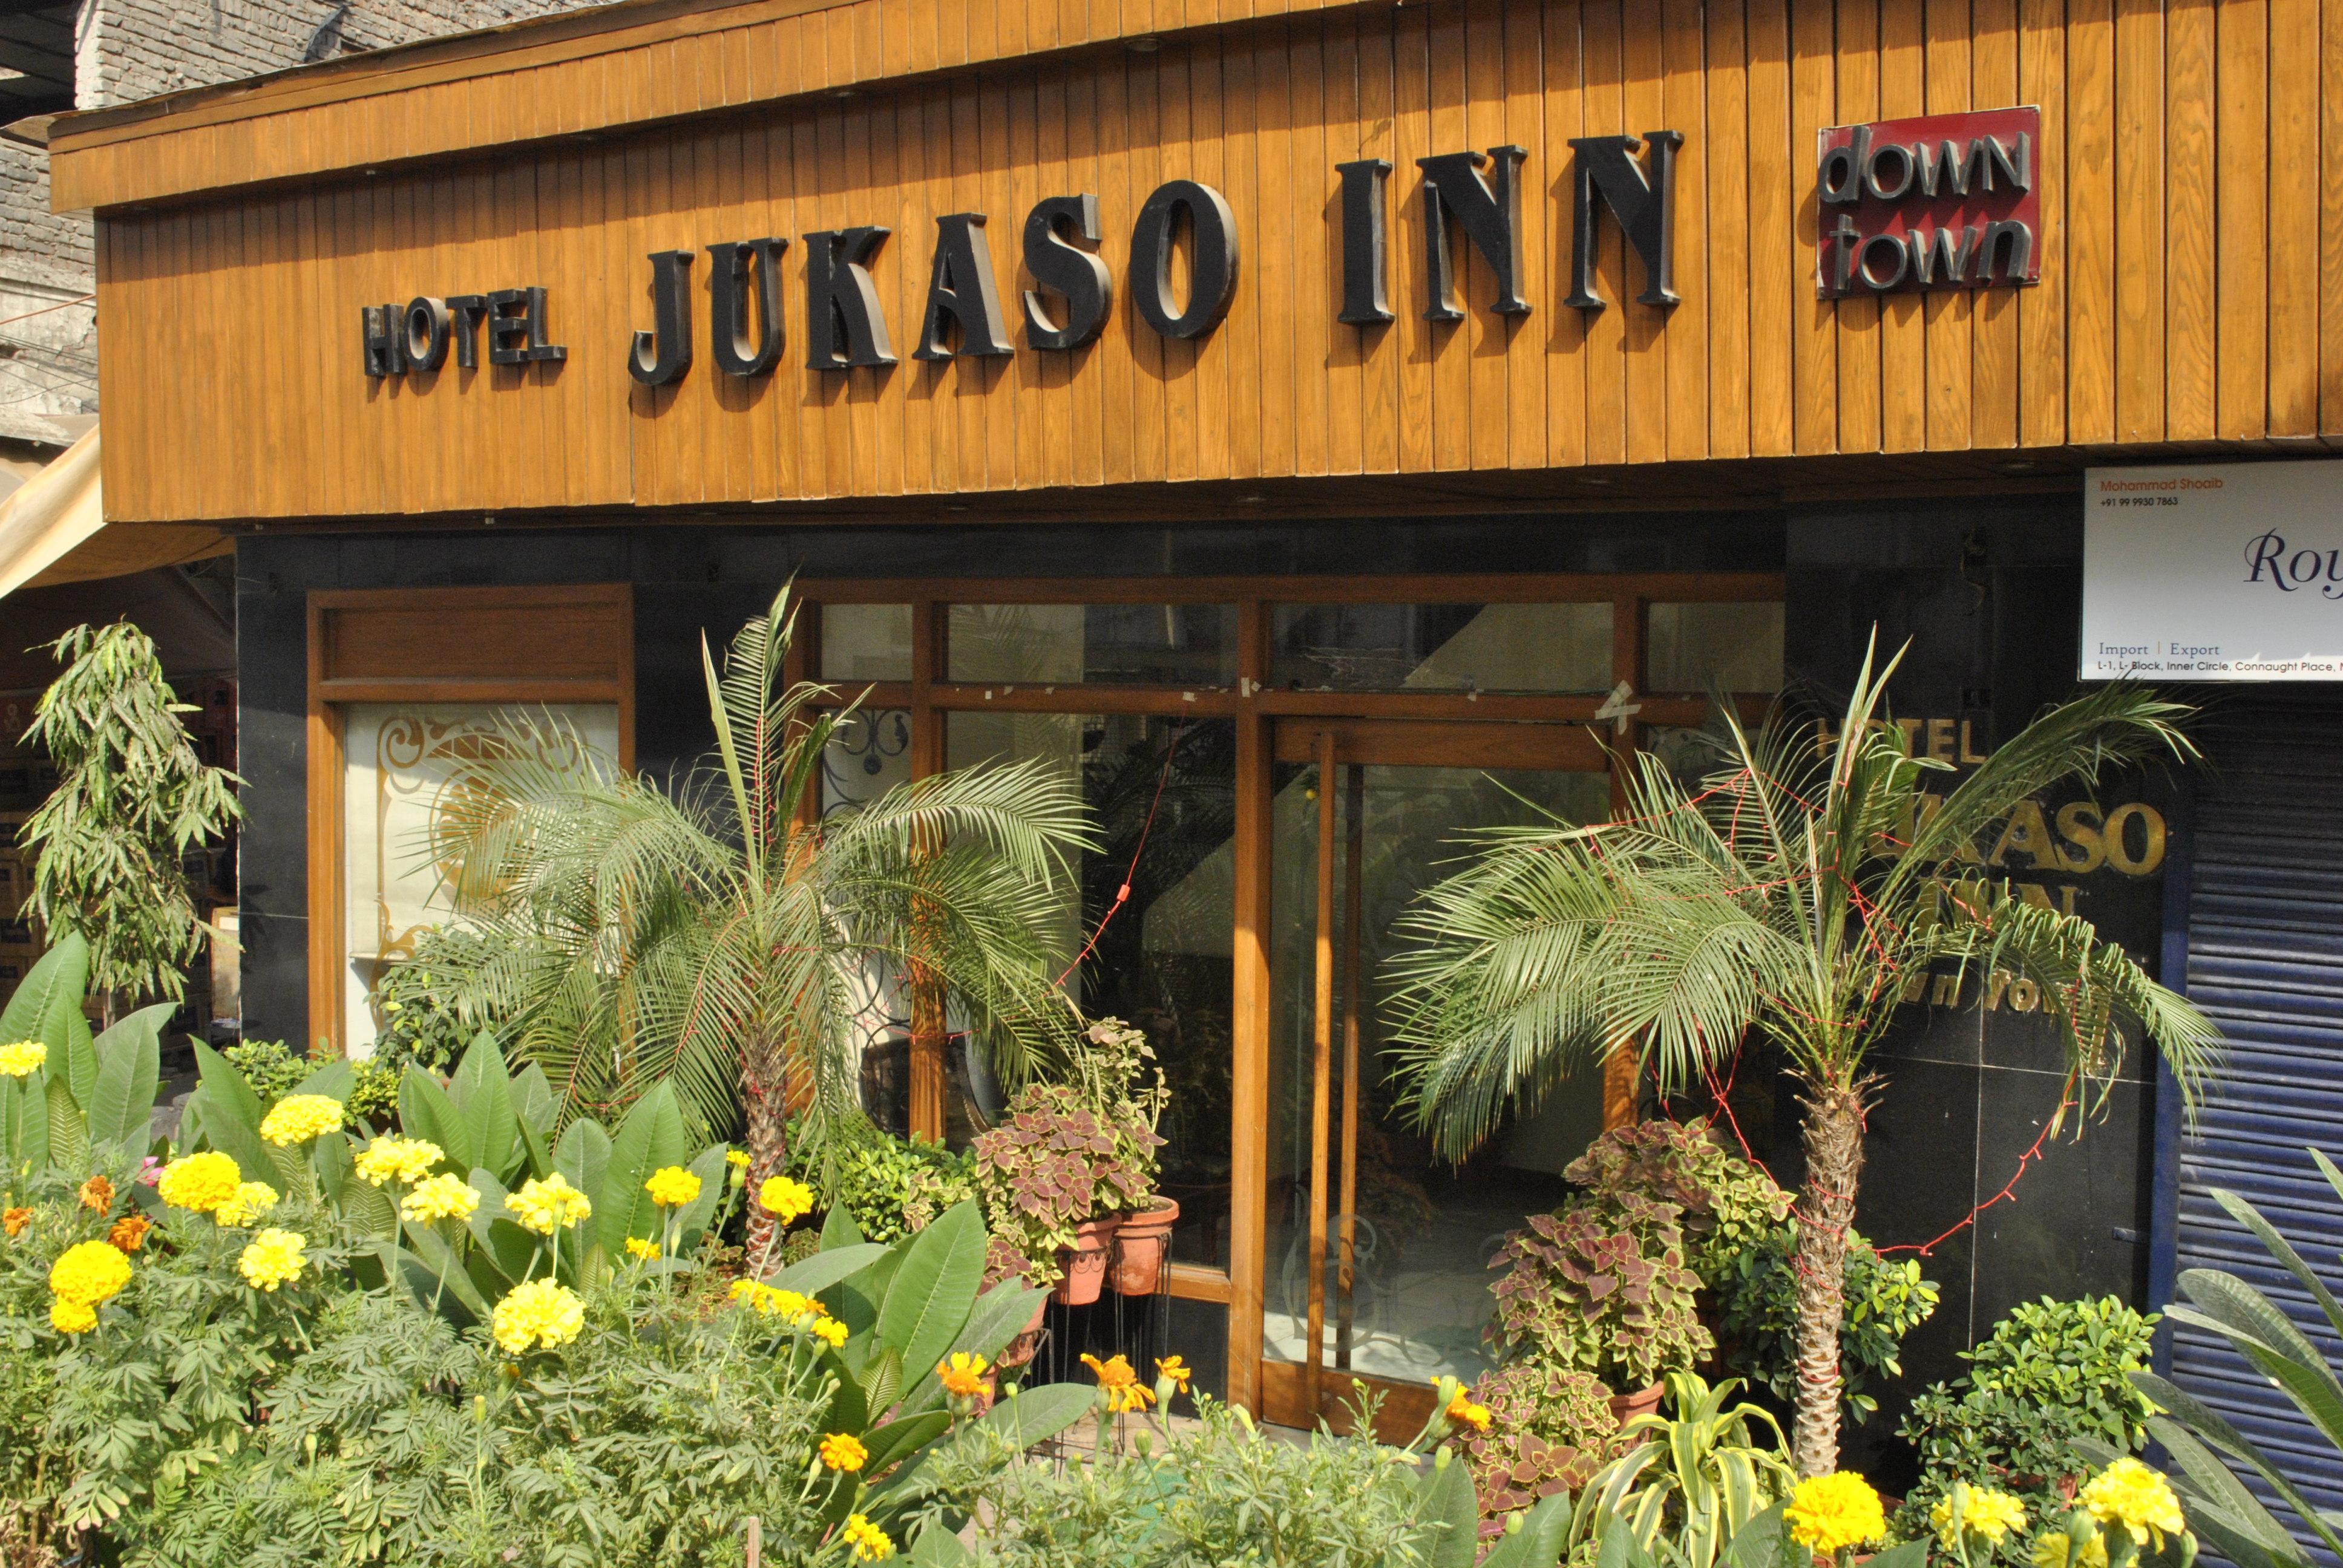 Hotel Jukaso Down Town